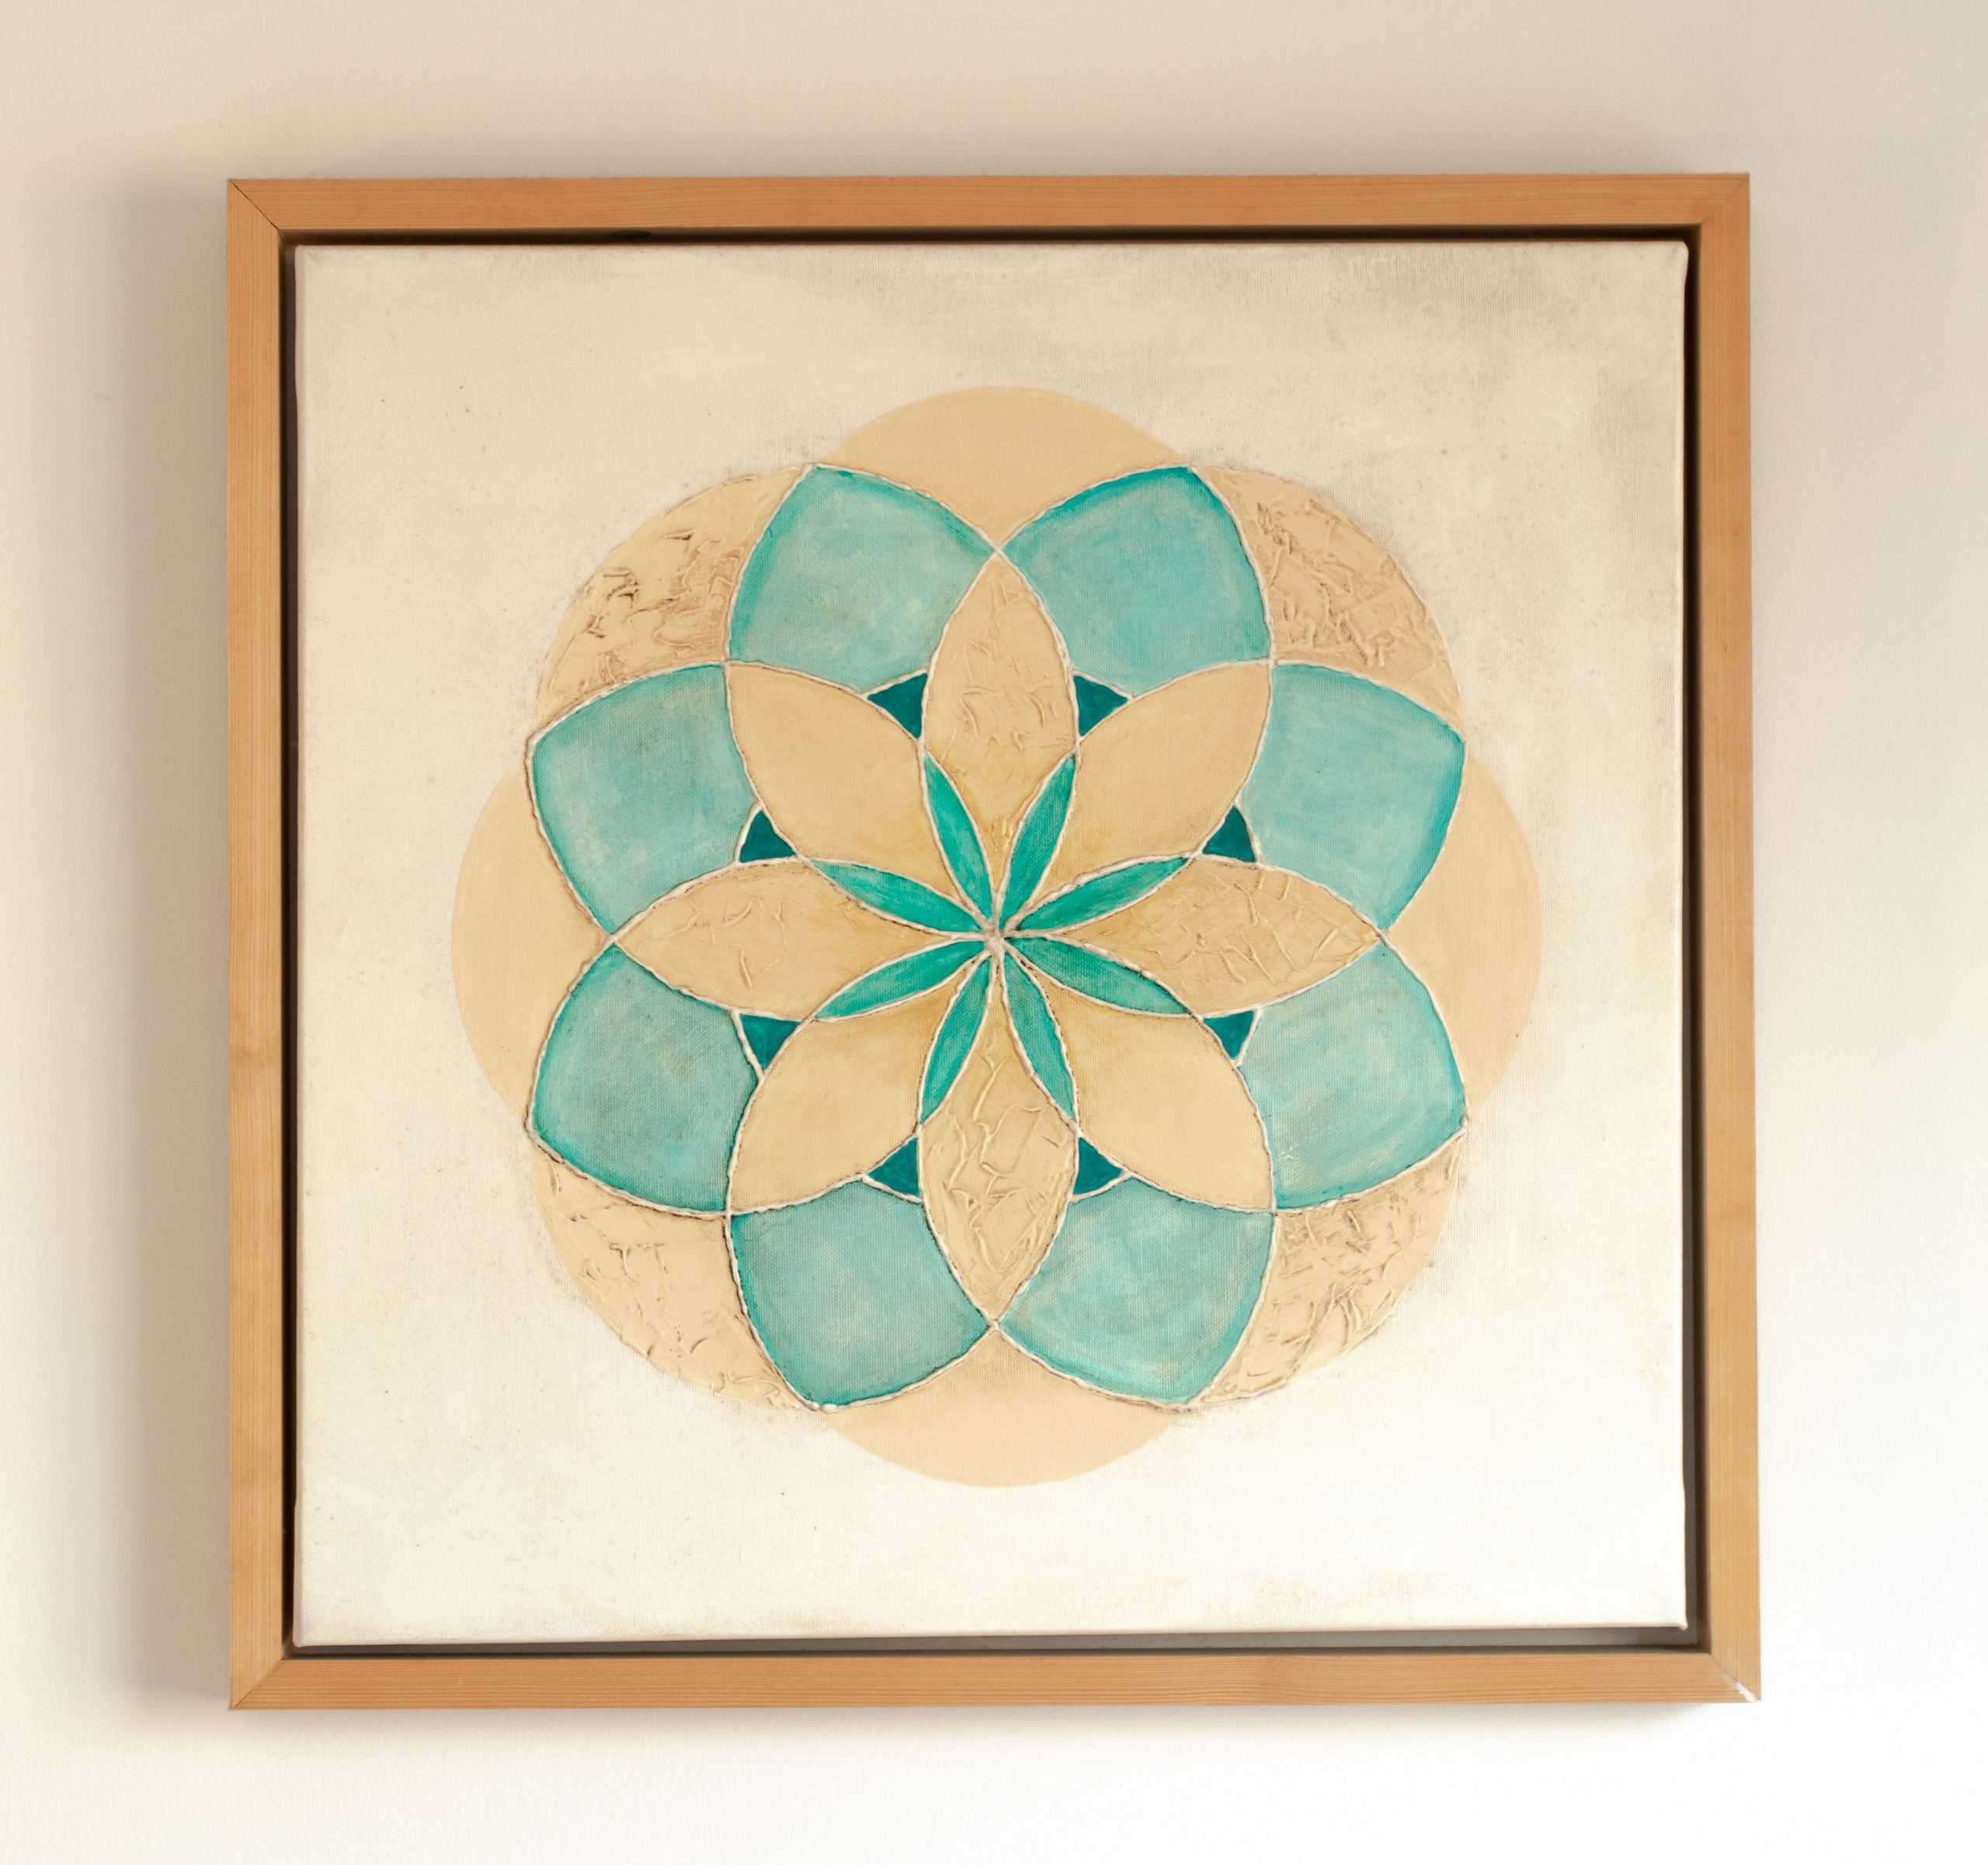 Claudia-art-gallery-decoracao-acrilic-on-canvas-2